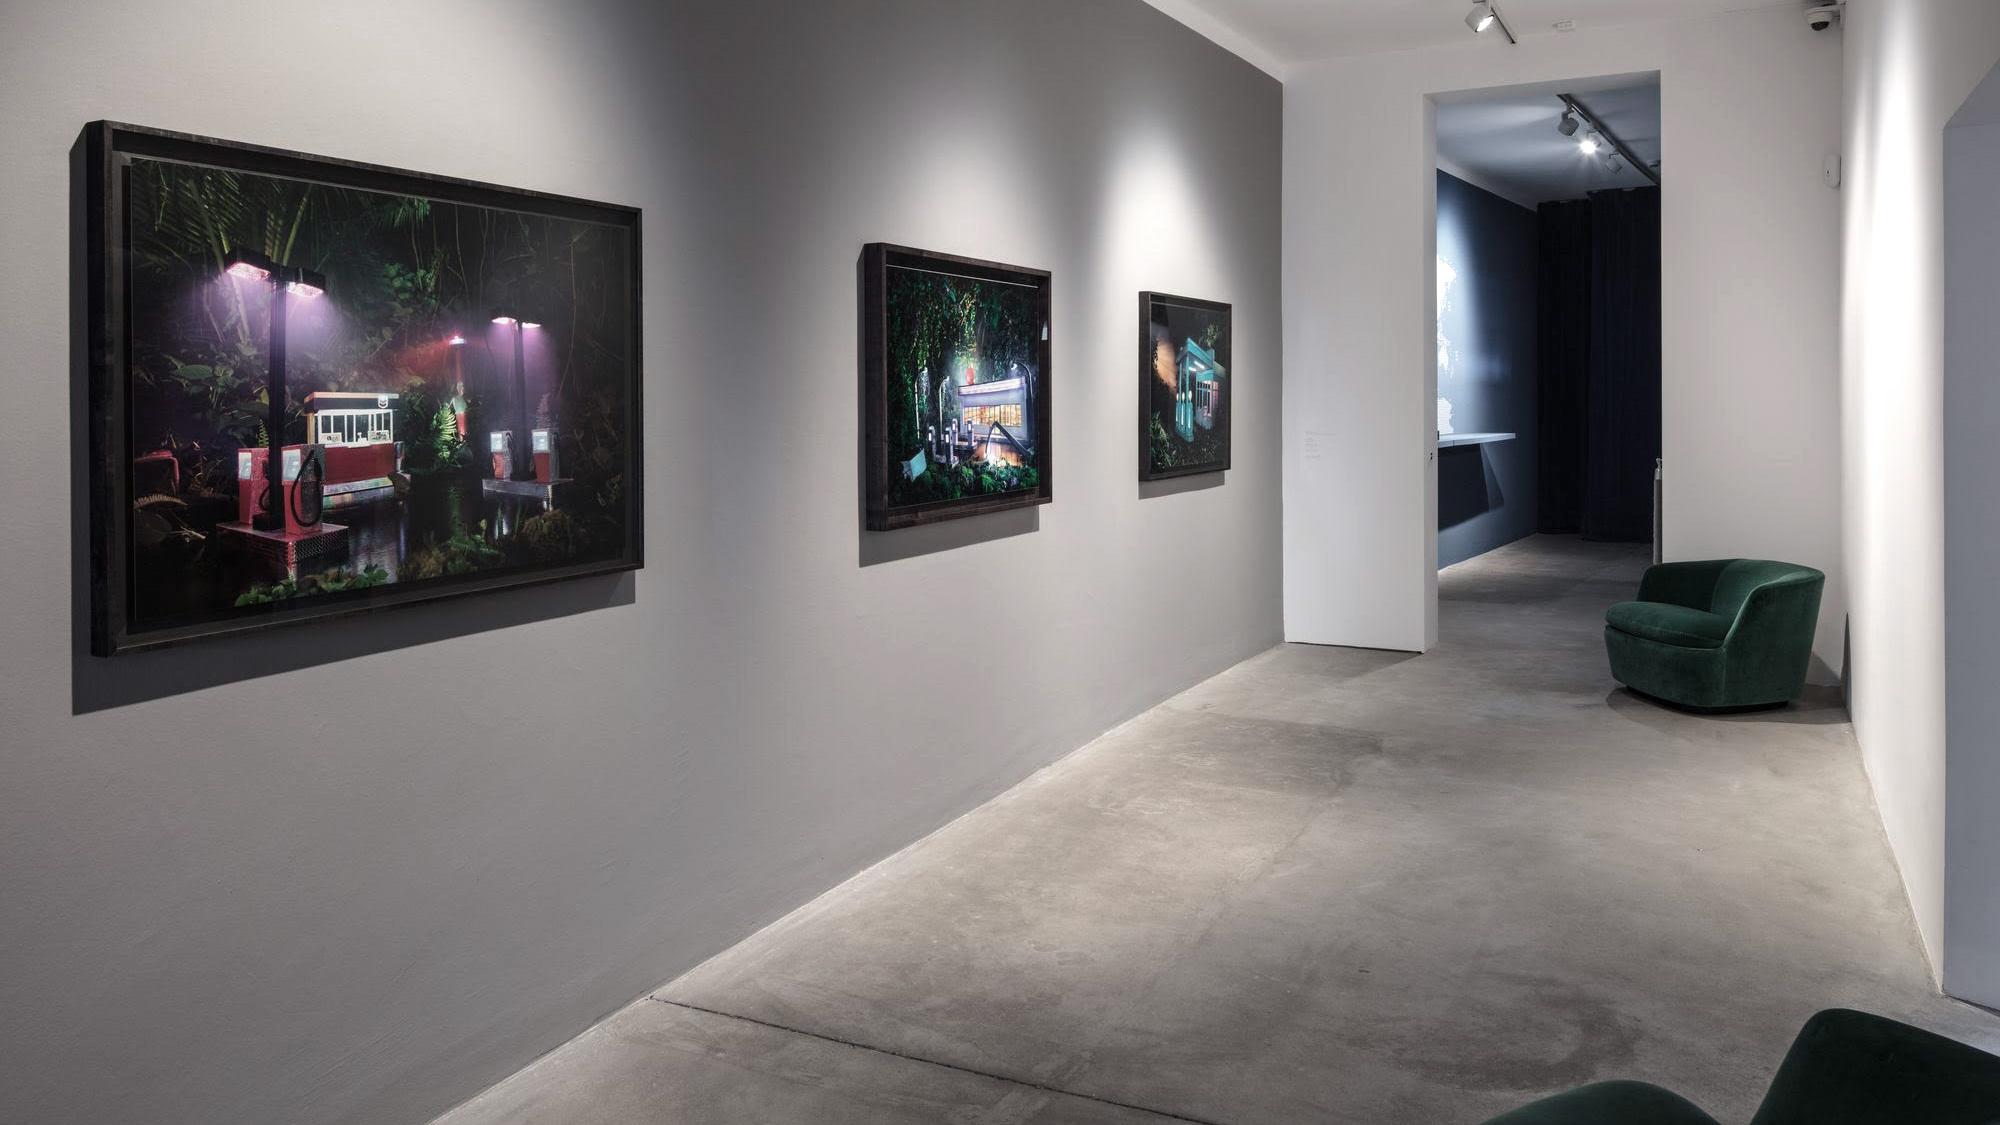 Installation view: David LaChapelle: Gas Chevron, Gas am pm, Gas 76, all 2012, C-prints. Courtesy David LaChapelle Studio.